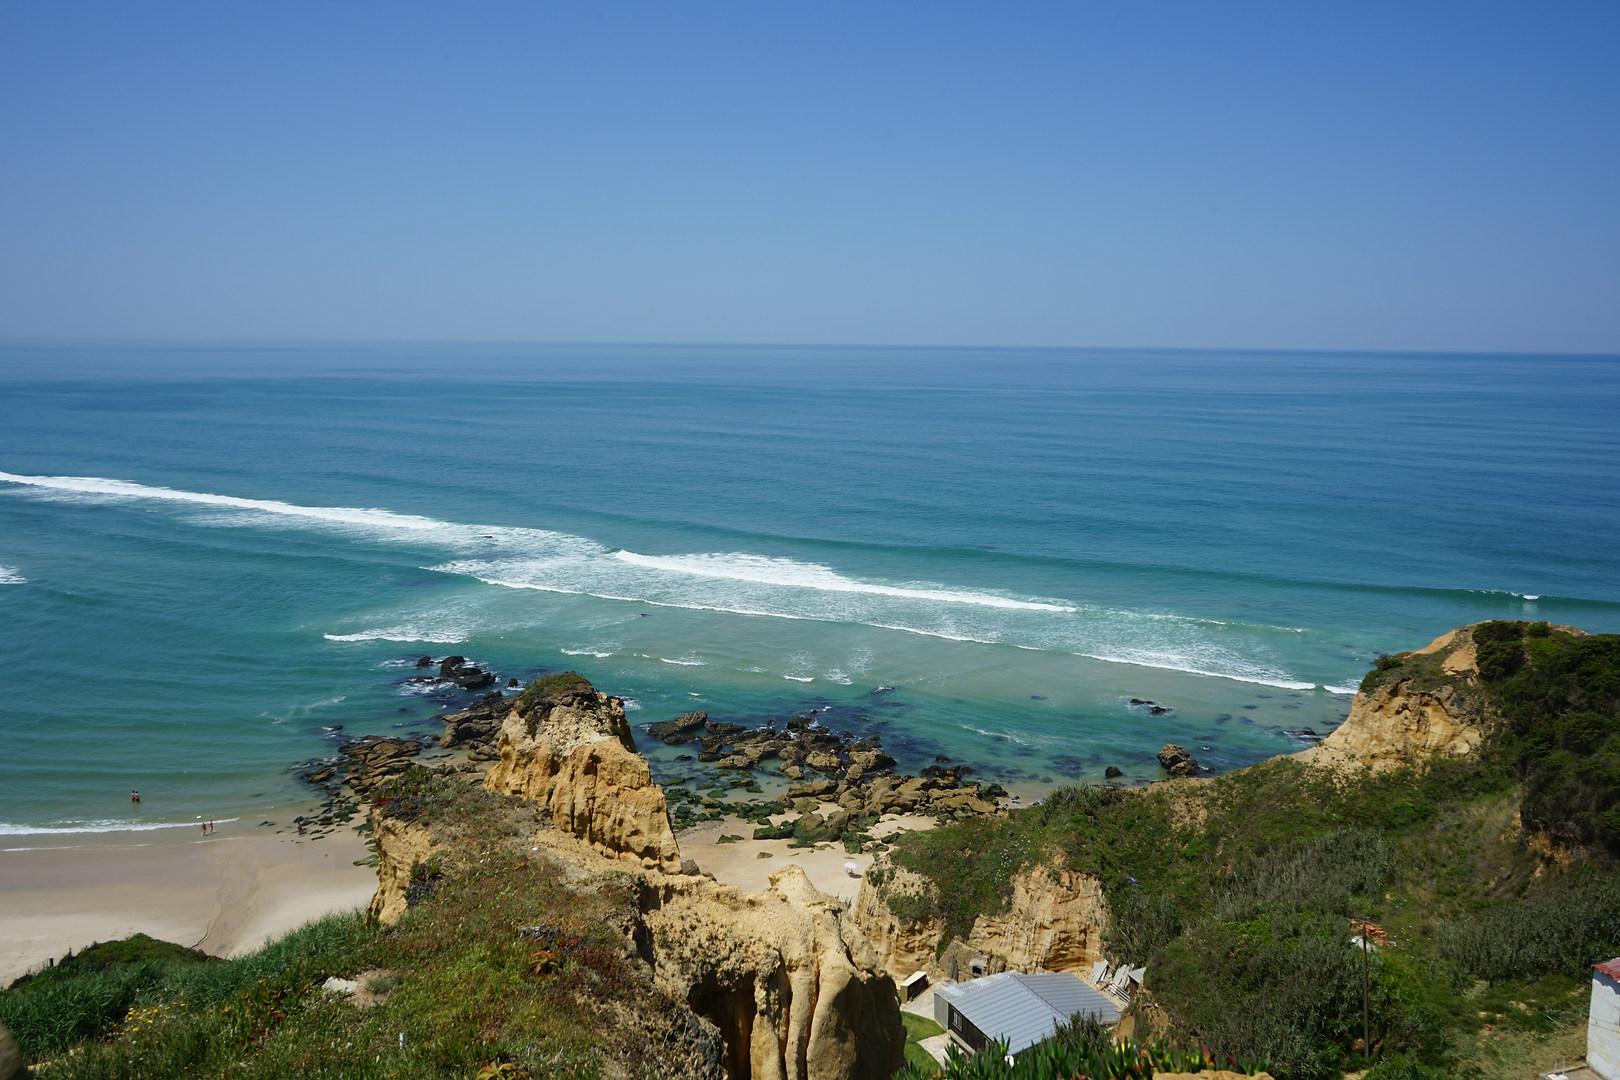 Serra da Pescaria and Salgado Beach